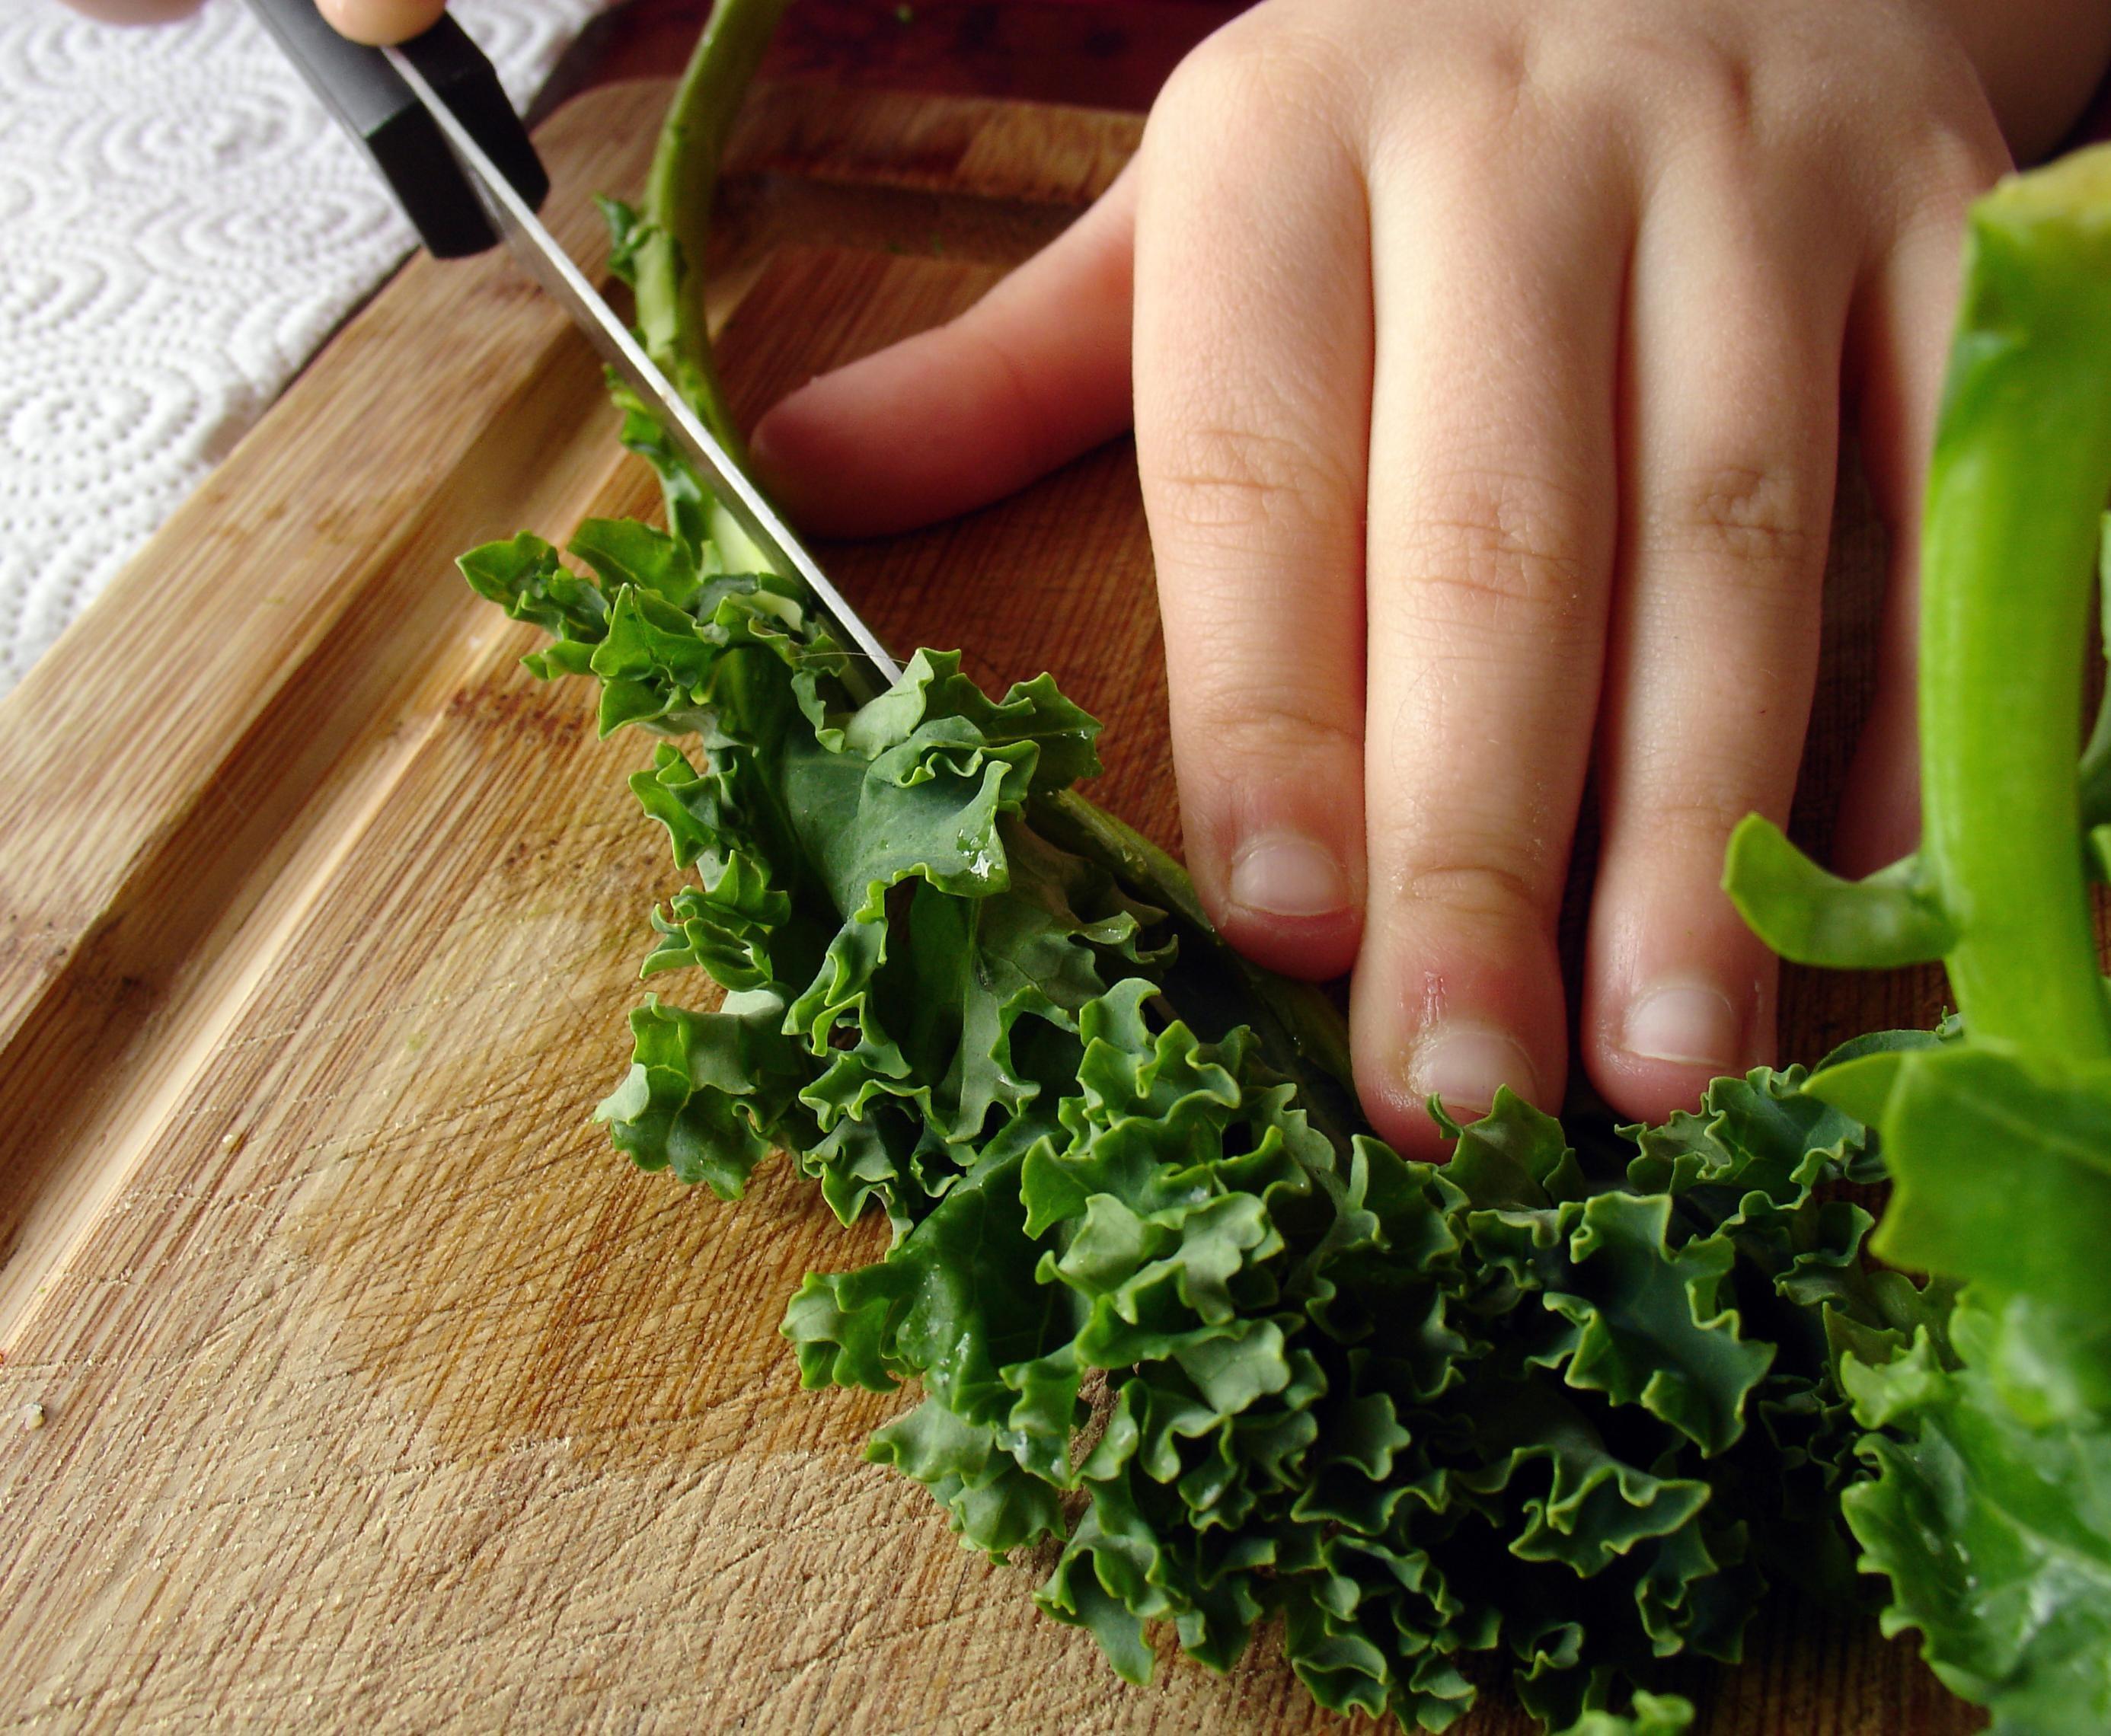 mindful cooking, mindfulness in the kitchen, Edward Espe Brown, Tassajara, Lion's Roar, kale, cutting vegetables